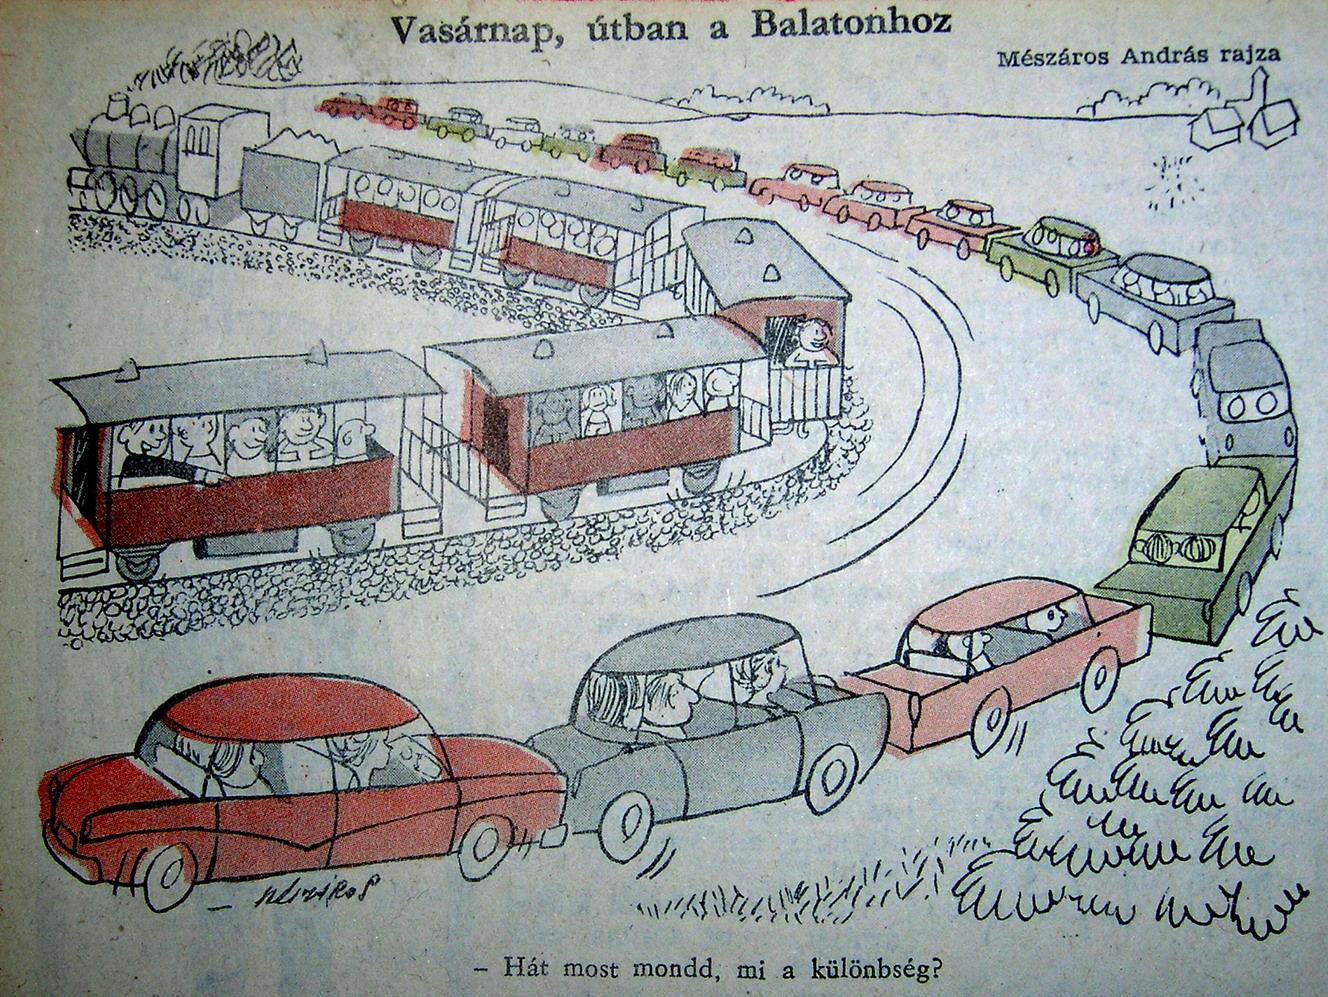 balaton_autokaravan_vonat1963_resize.jpg